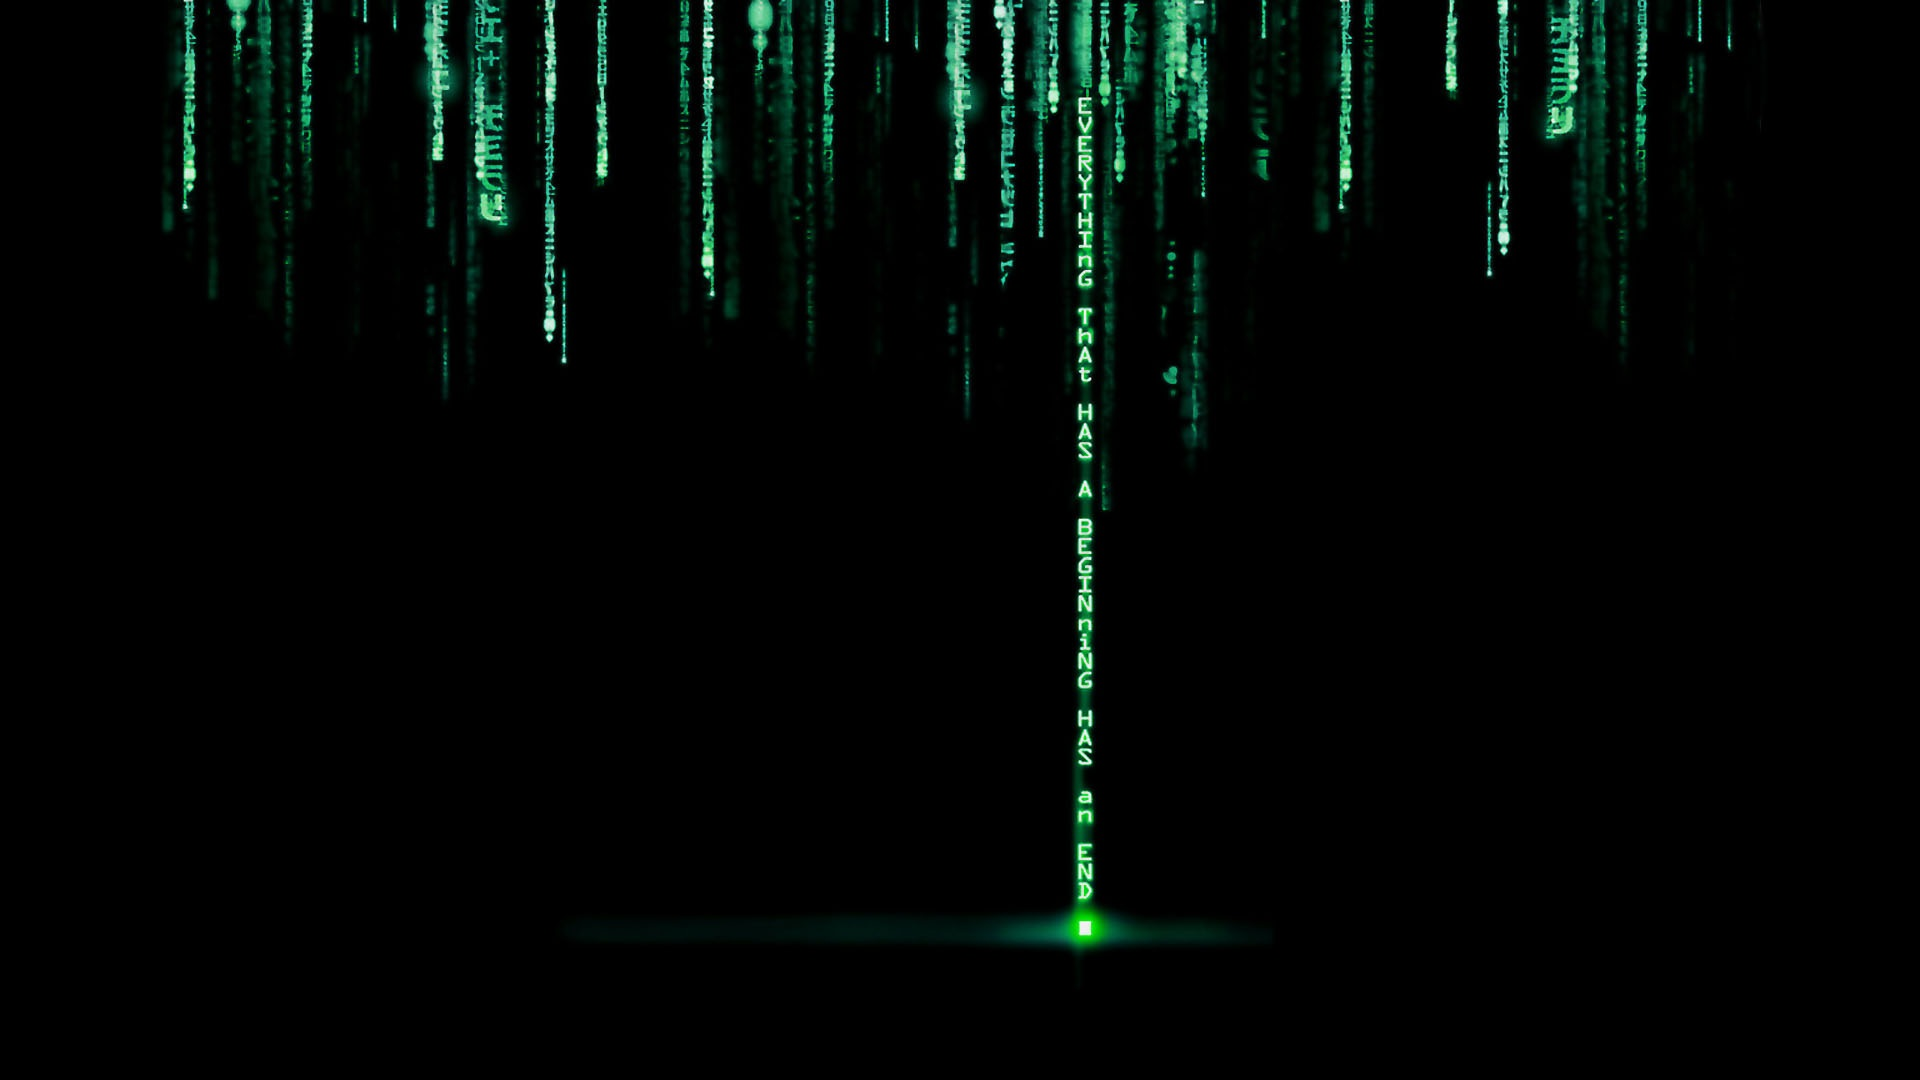 Free Download 37 Programmer Code Wallpaper Backgrounds